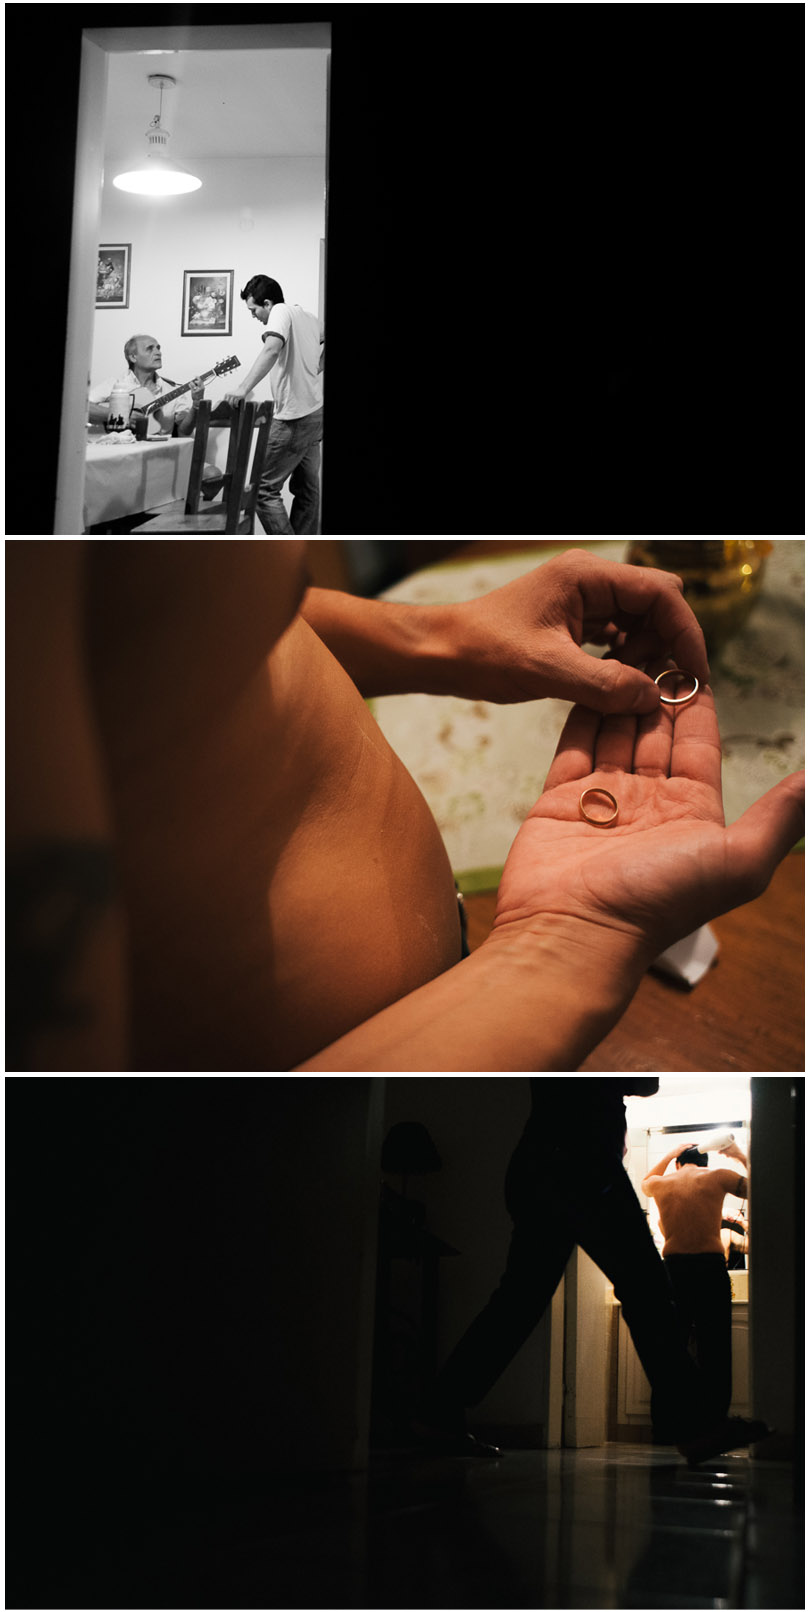 fotografos de casamientos cordoba argentina (3).jpg